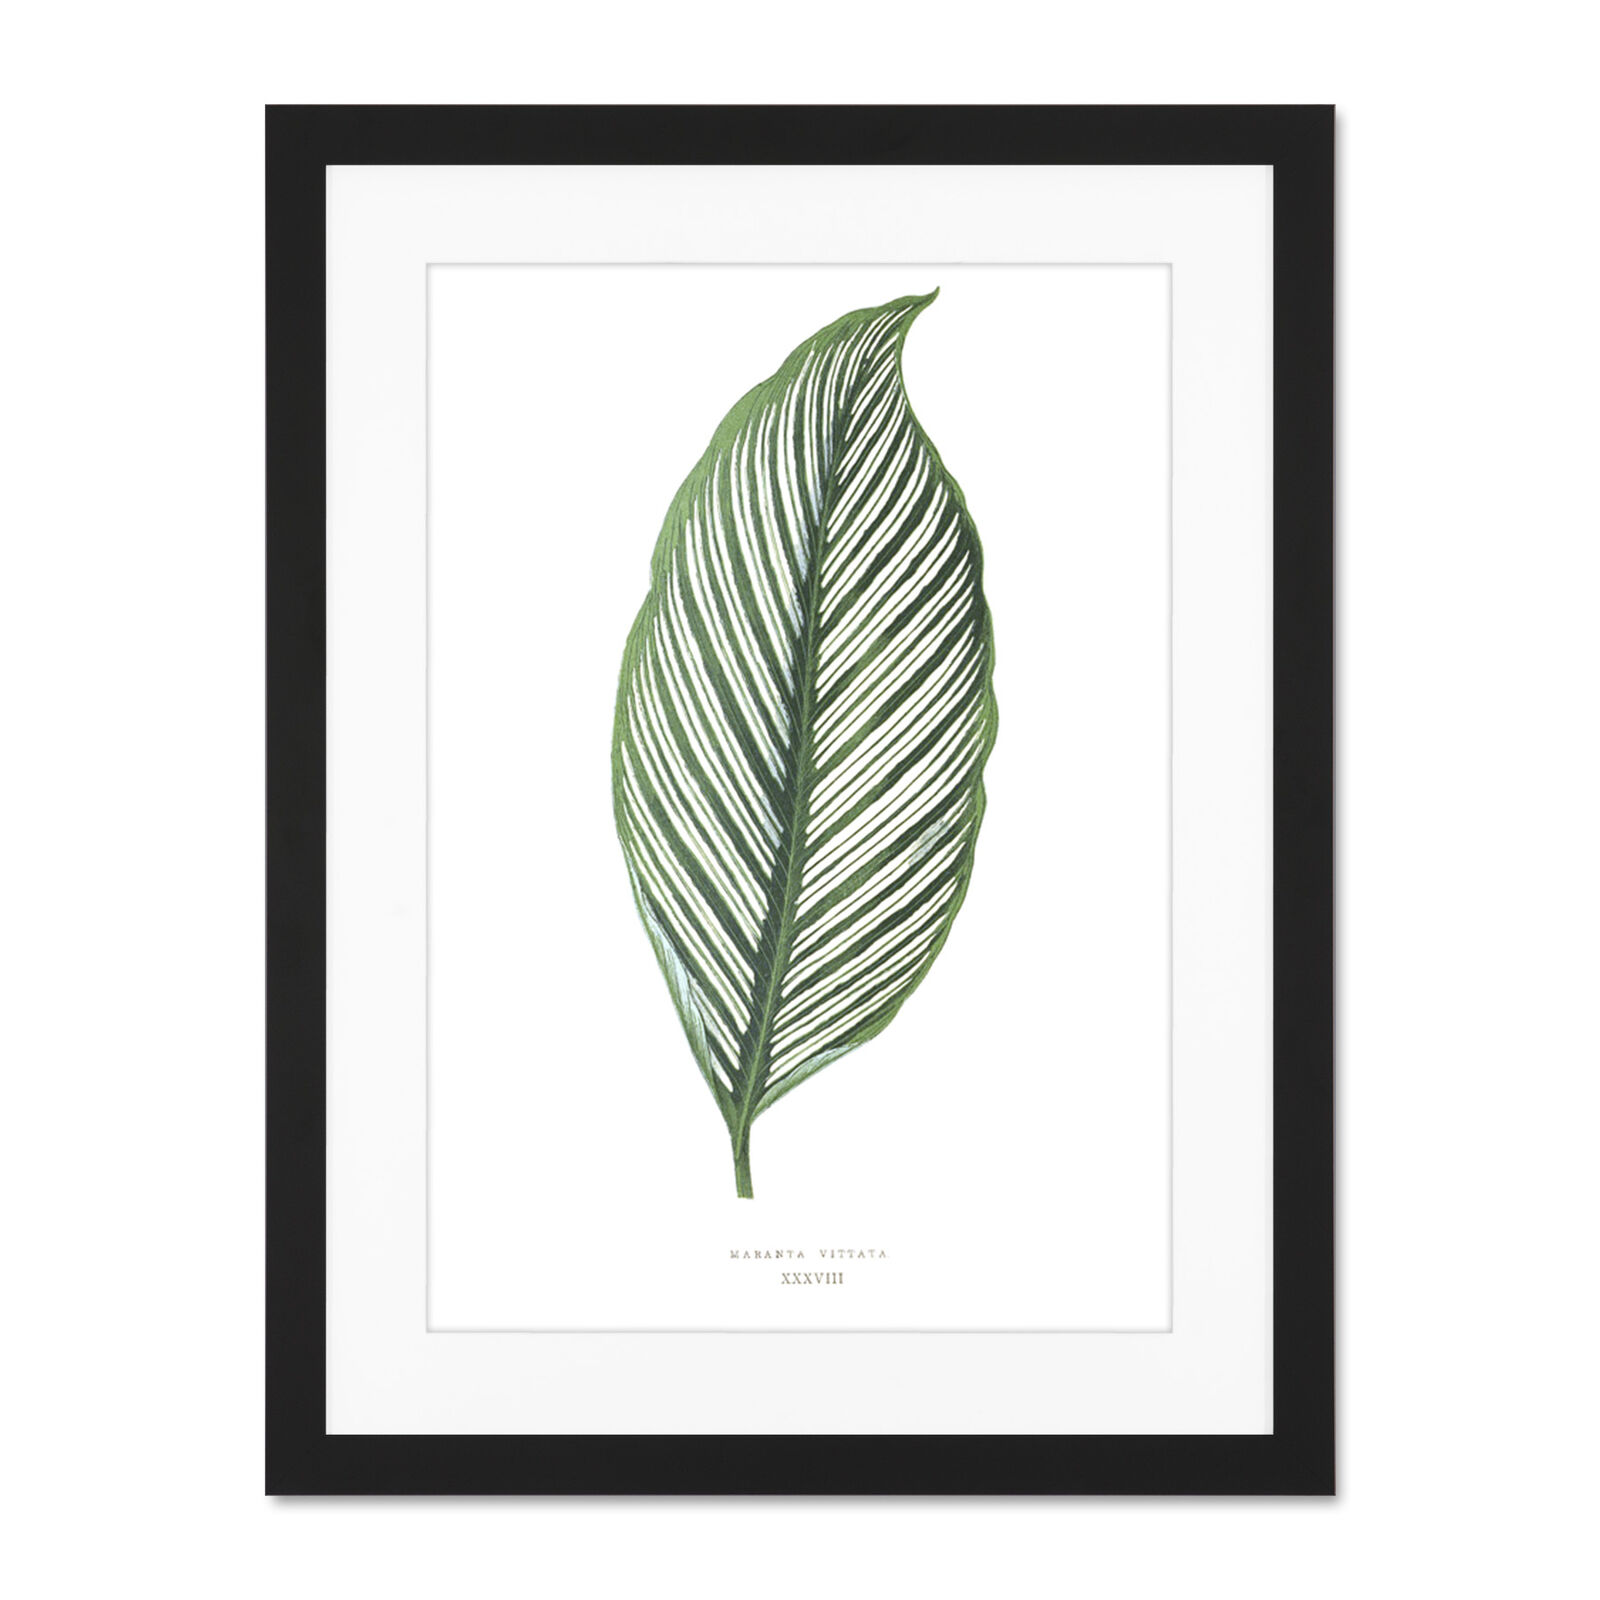 Leaf Maranta Vittata Large Framed Art Print Wall Poster